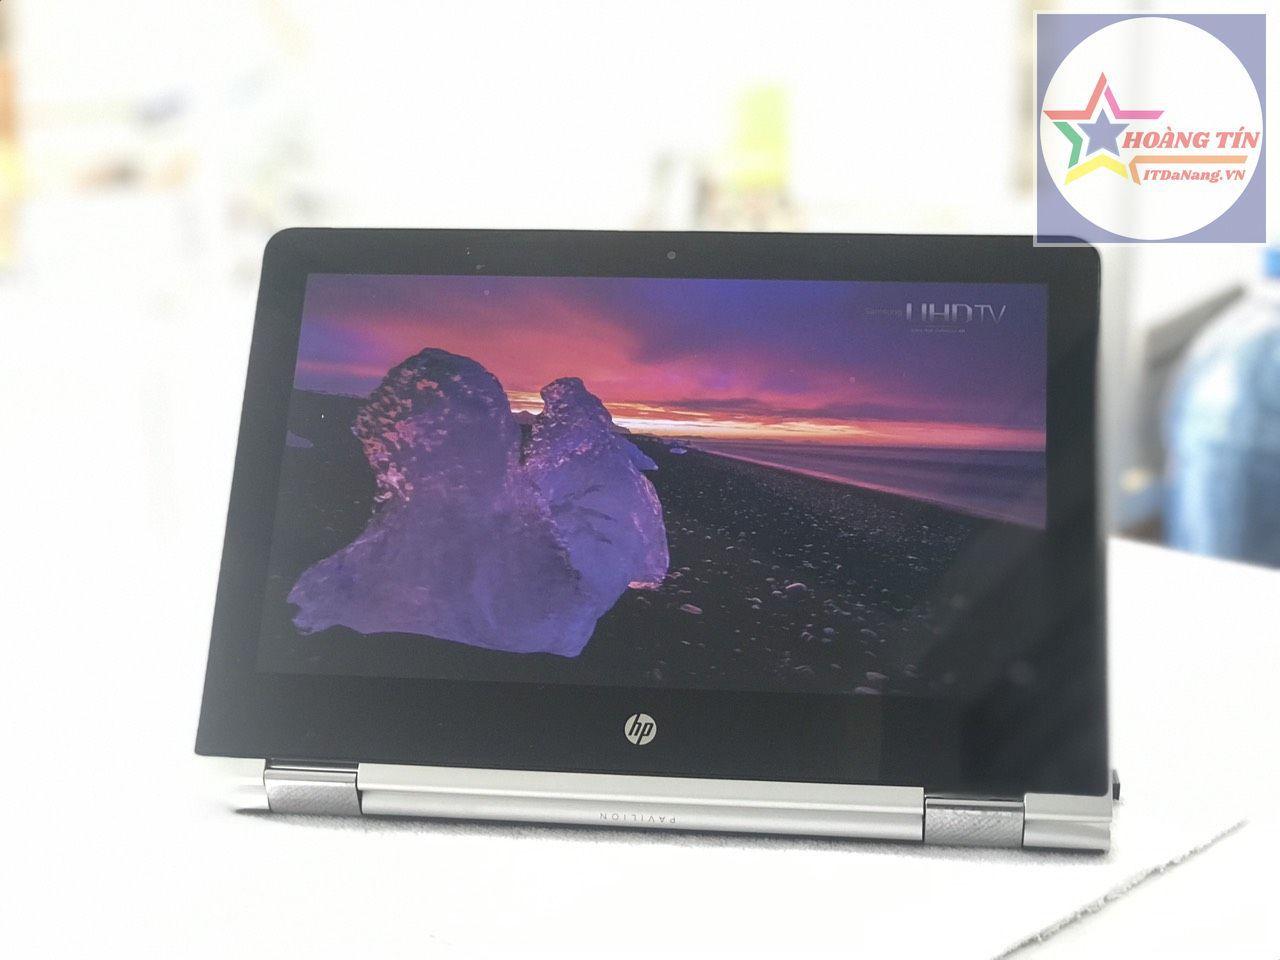 Laptop HP Palivion x360 Like New